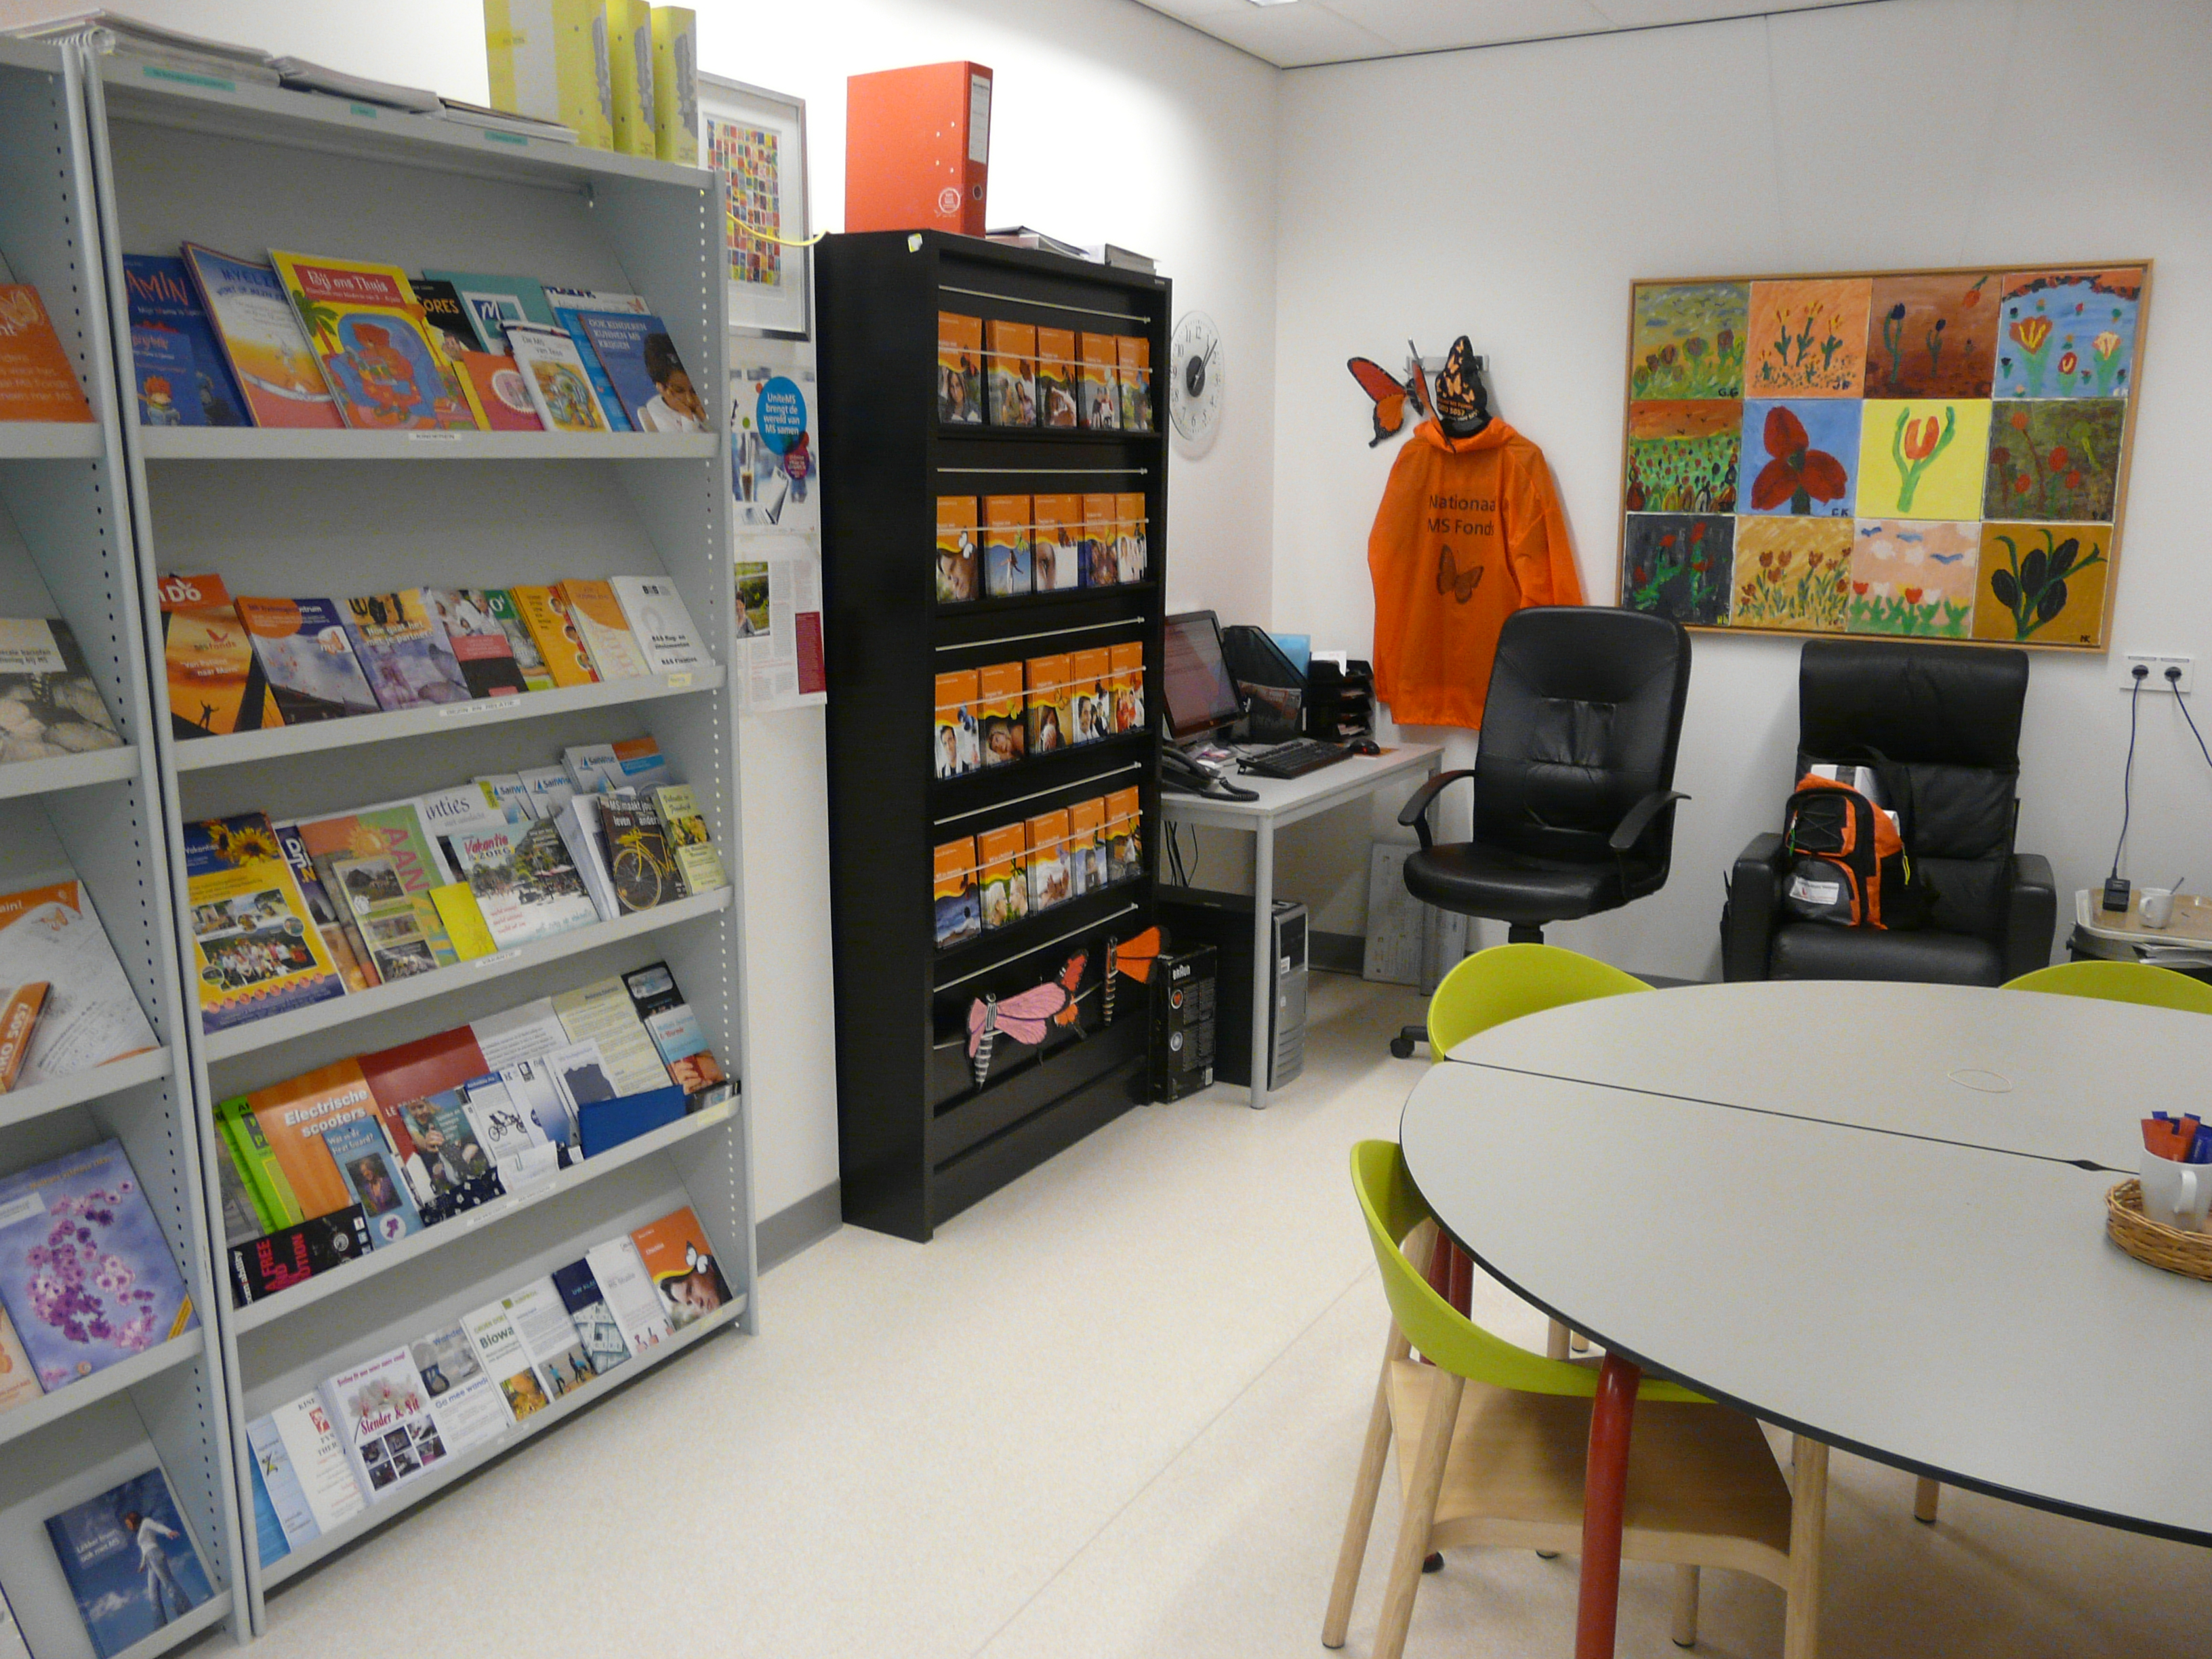 MS infocentrum